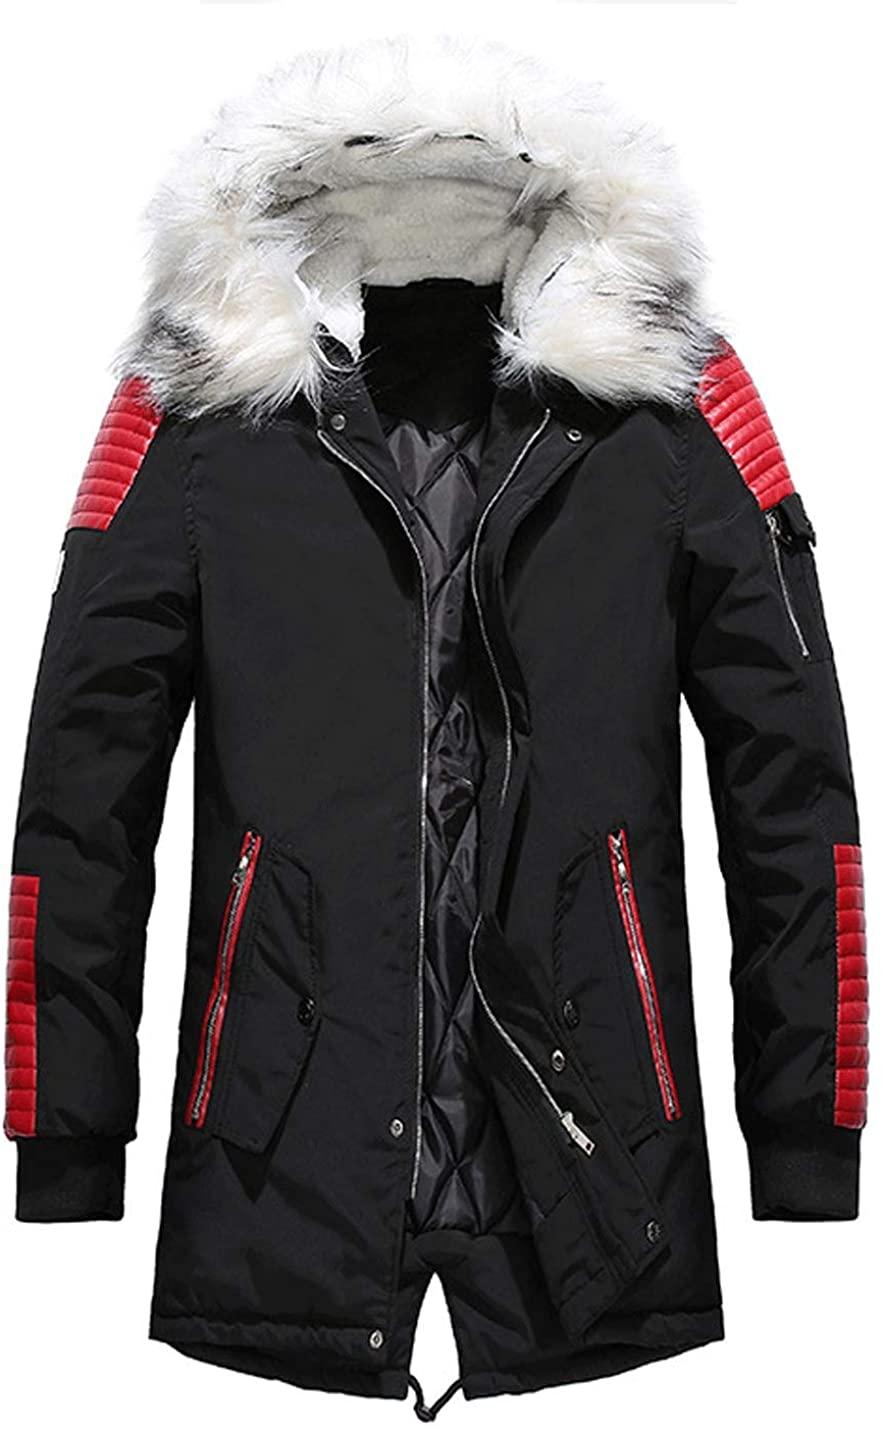 D.B.M Men's Fashion Long-Sleeved Thick Fur Collar Zipper Hooded Cotton Coat